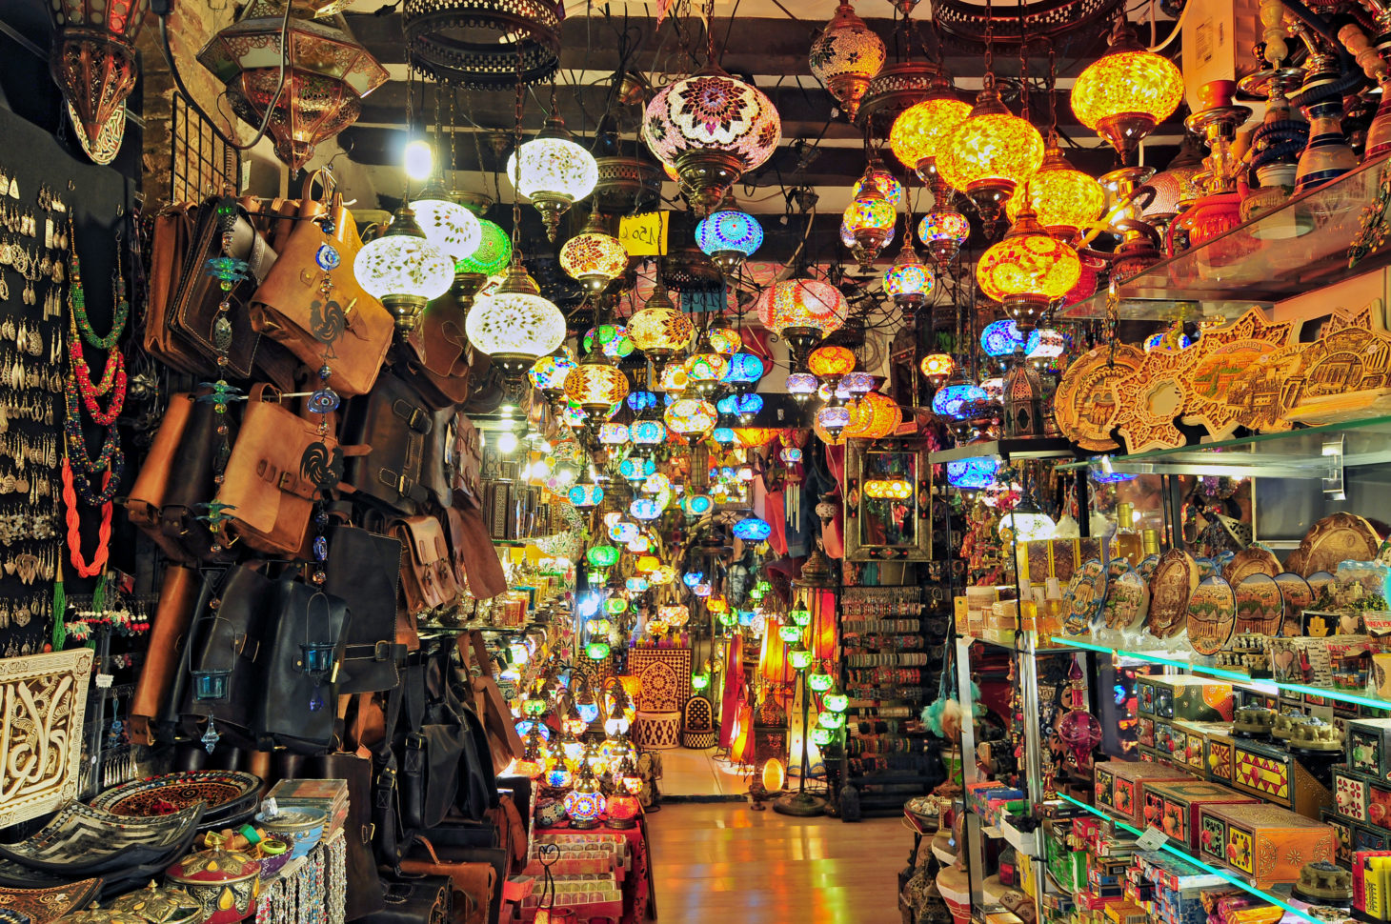 Granada souvenirs